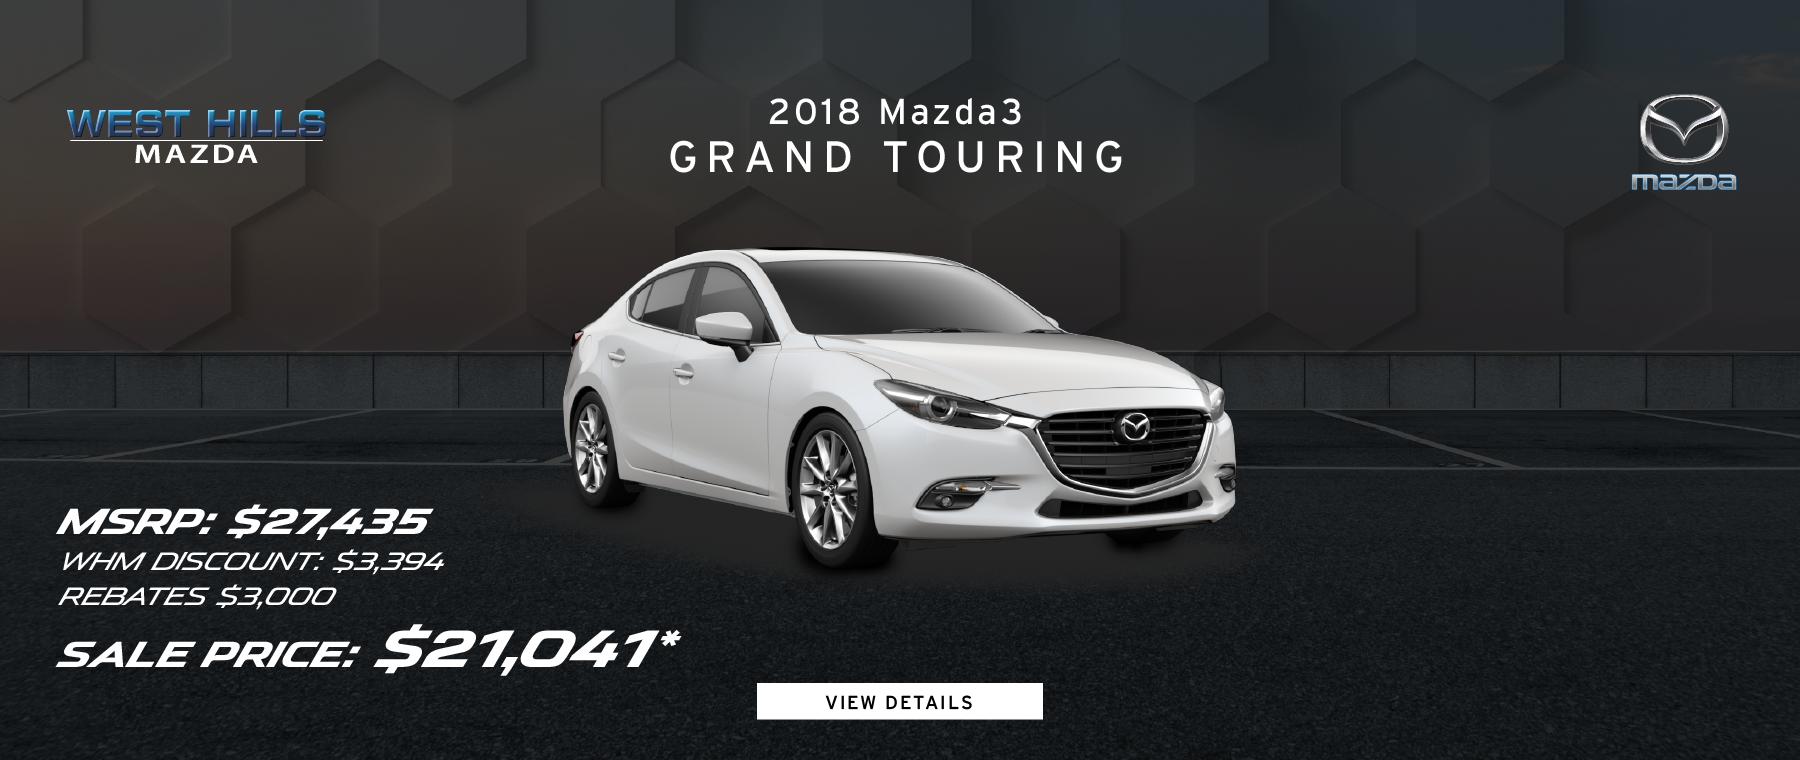 2018 Mazda3 Grand Touring   MSRP: $27,435 WHM Discount: $3,394 Rebate: $3,000 Sale Price: $21,041*